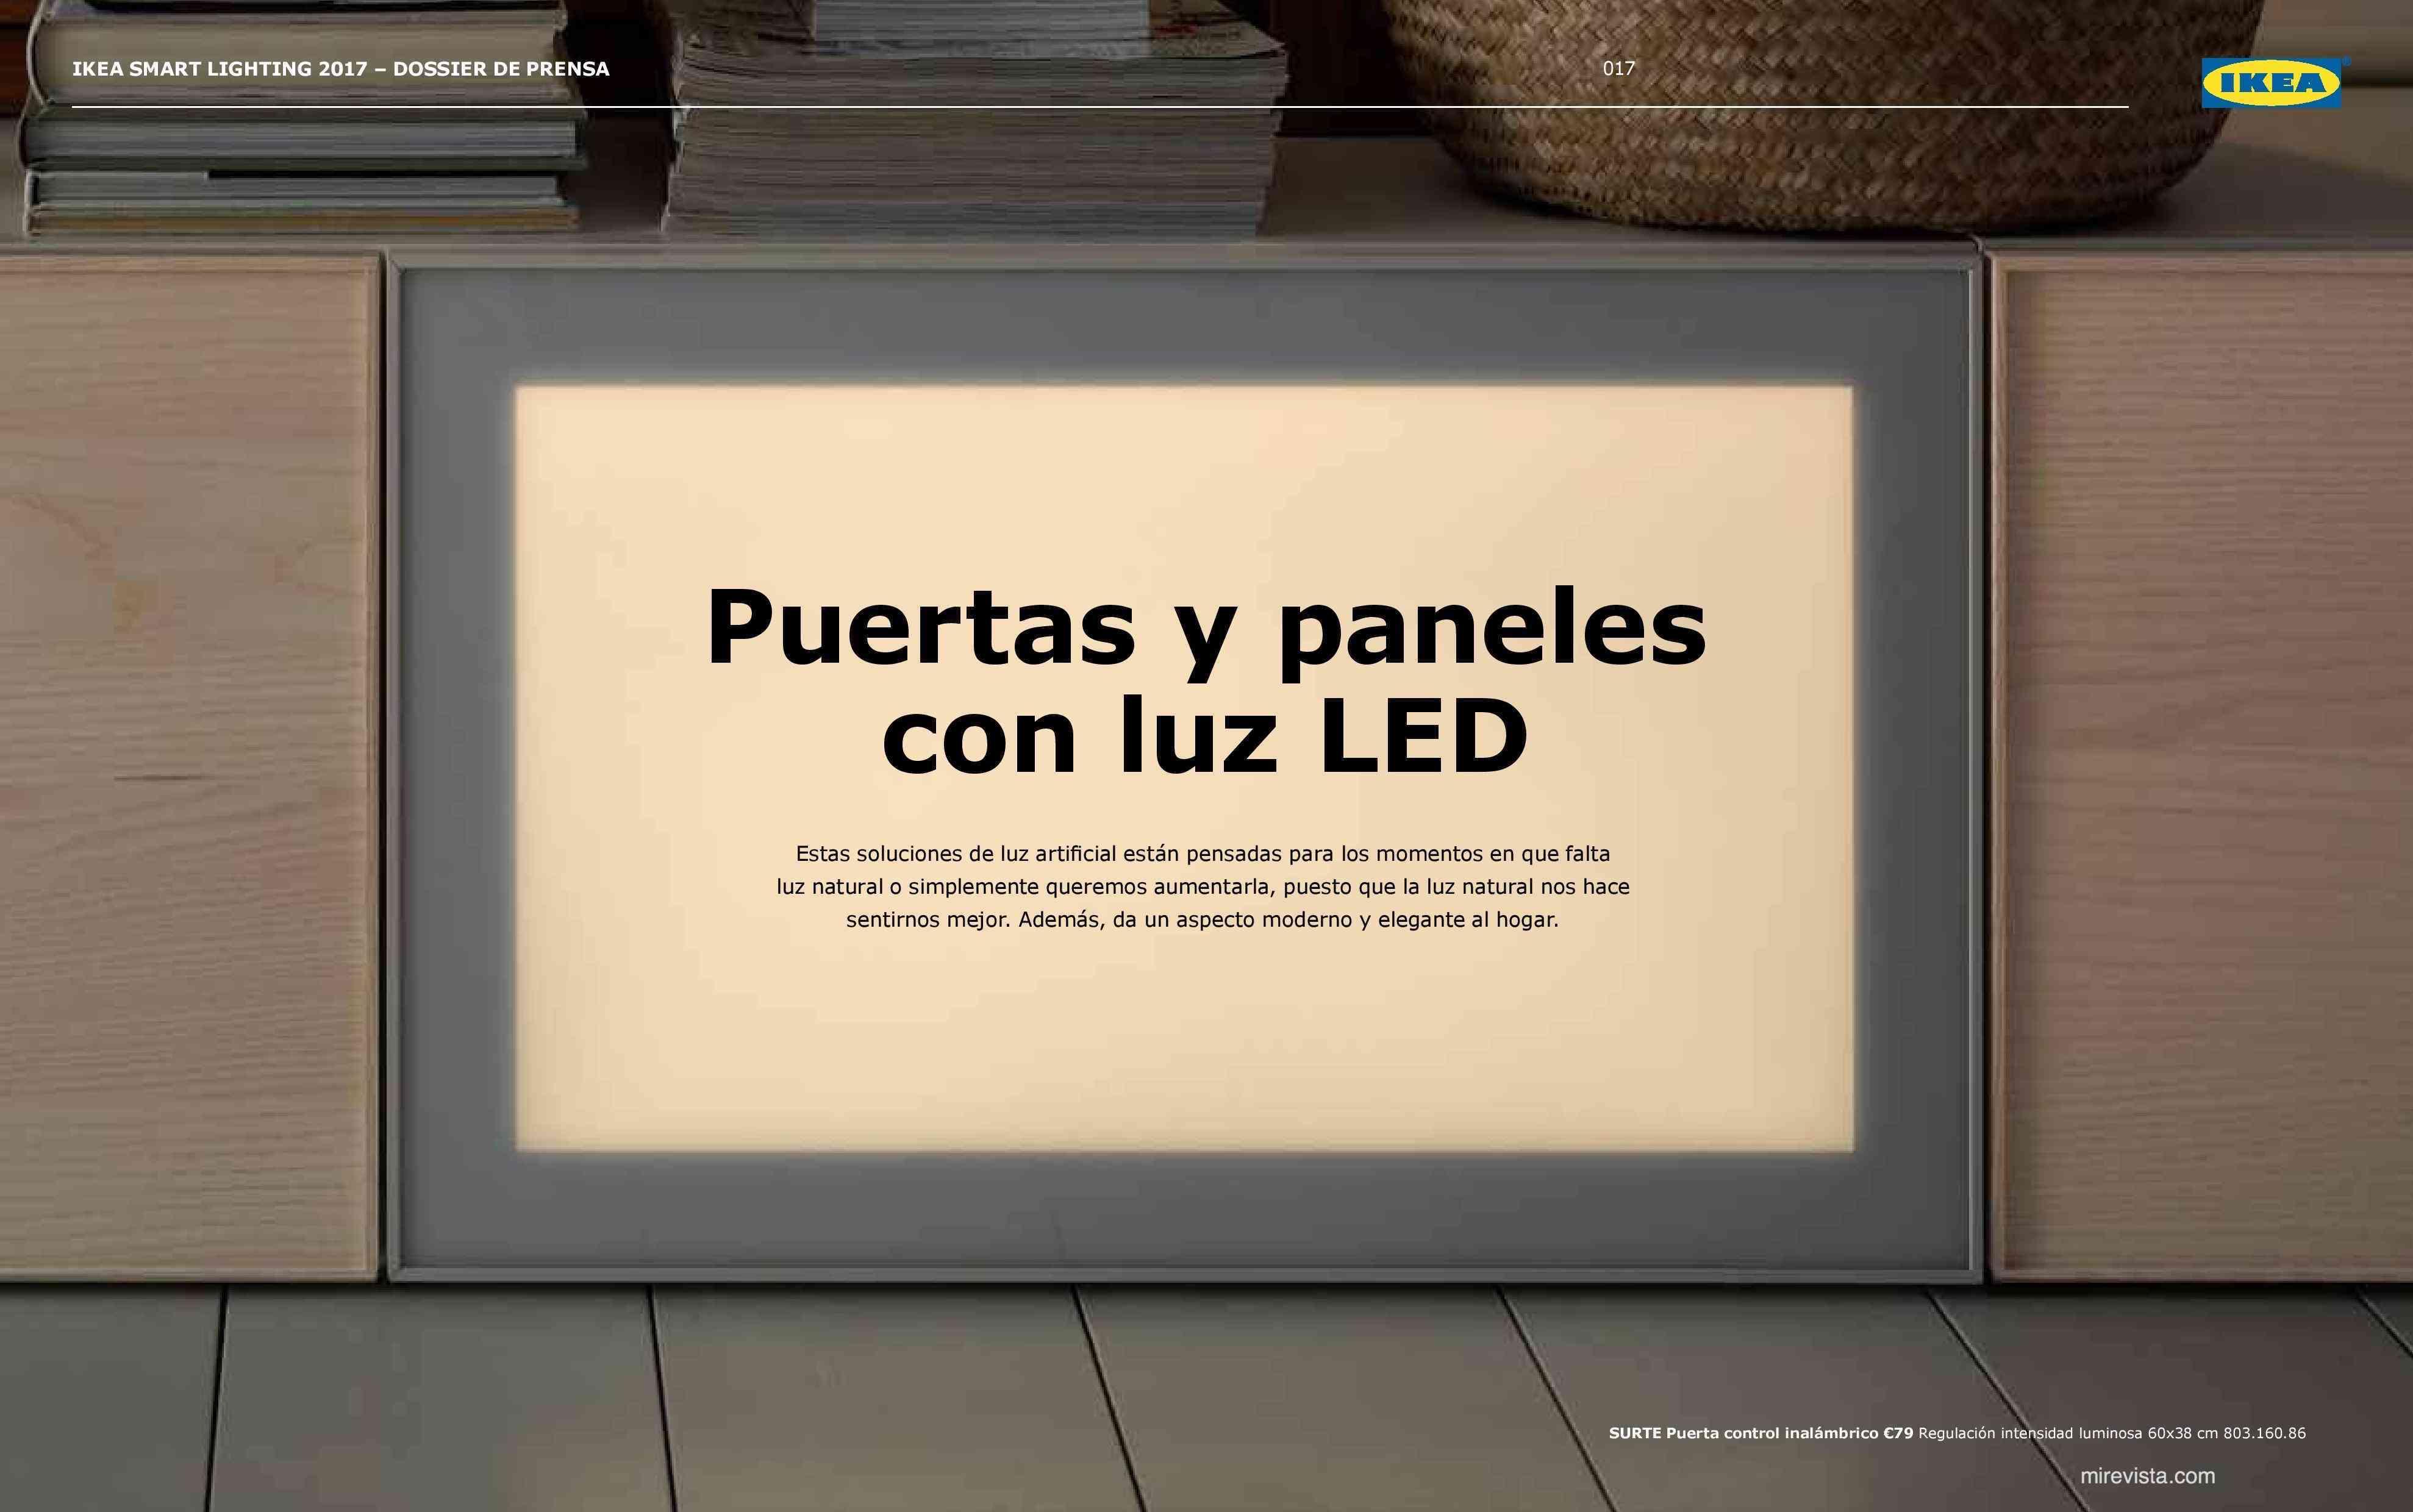 Novedades en iluminación de casas inteligentes con IKEA 73